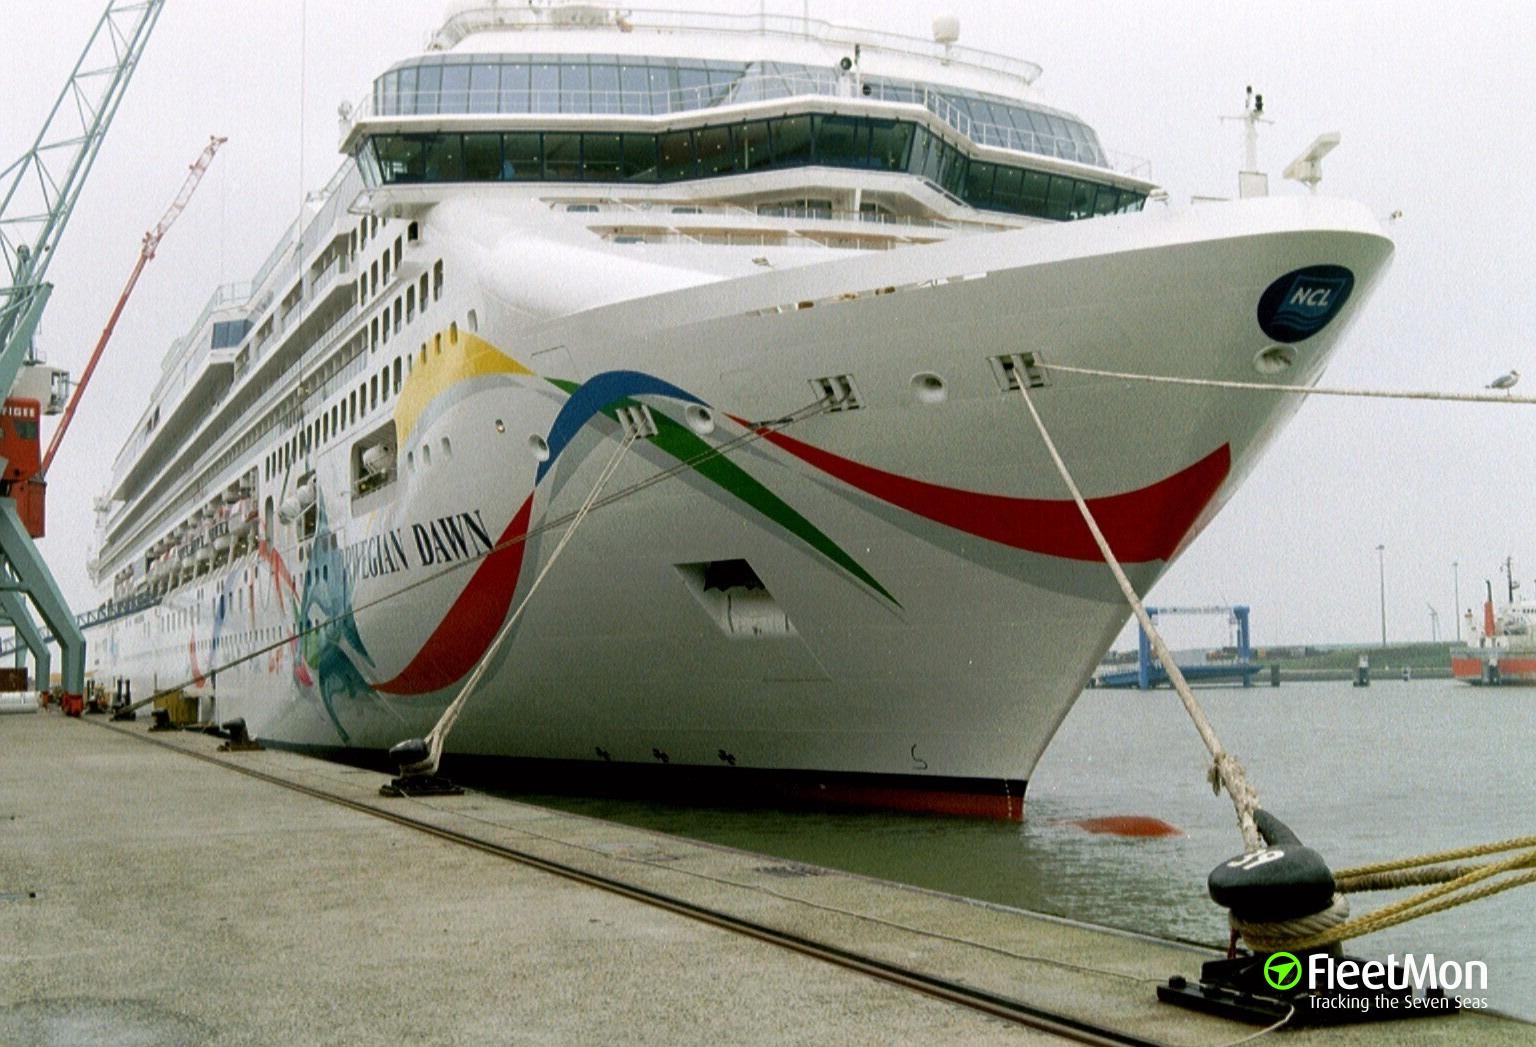 Cruise liner Norwegian Dawn refloated